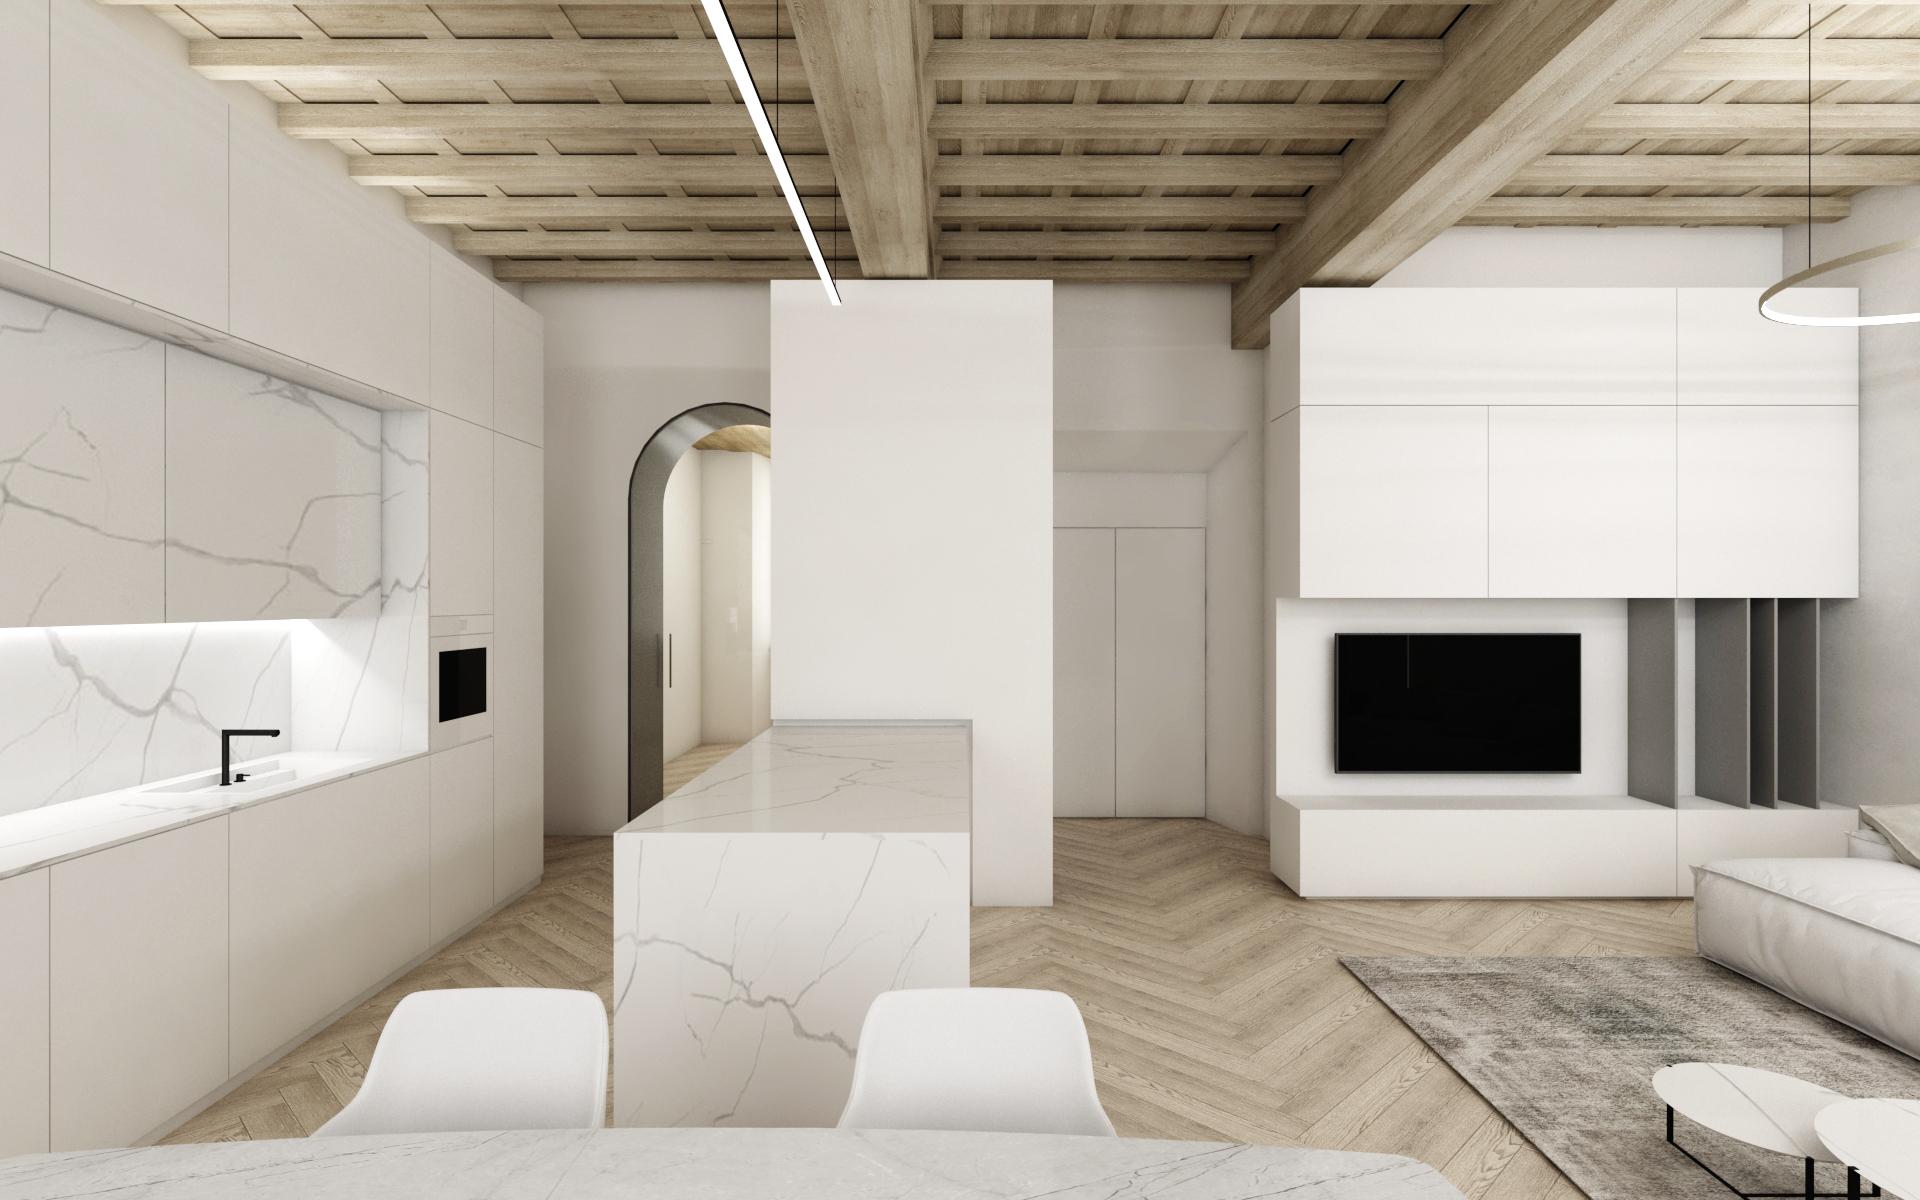 1803_DFG-Architetti-Associati_CASA-GIANNINI_-6